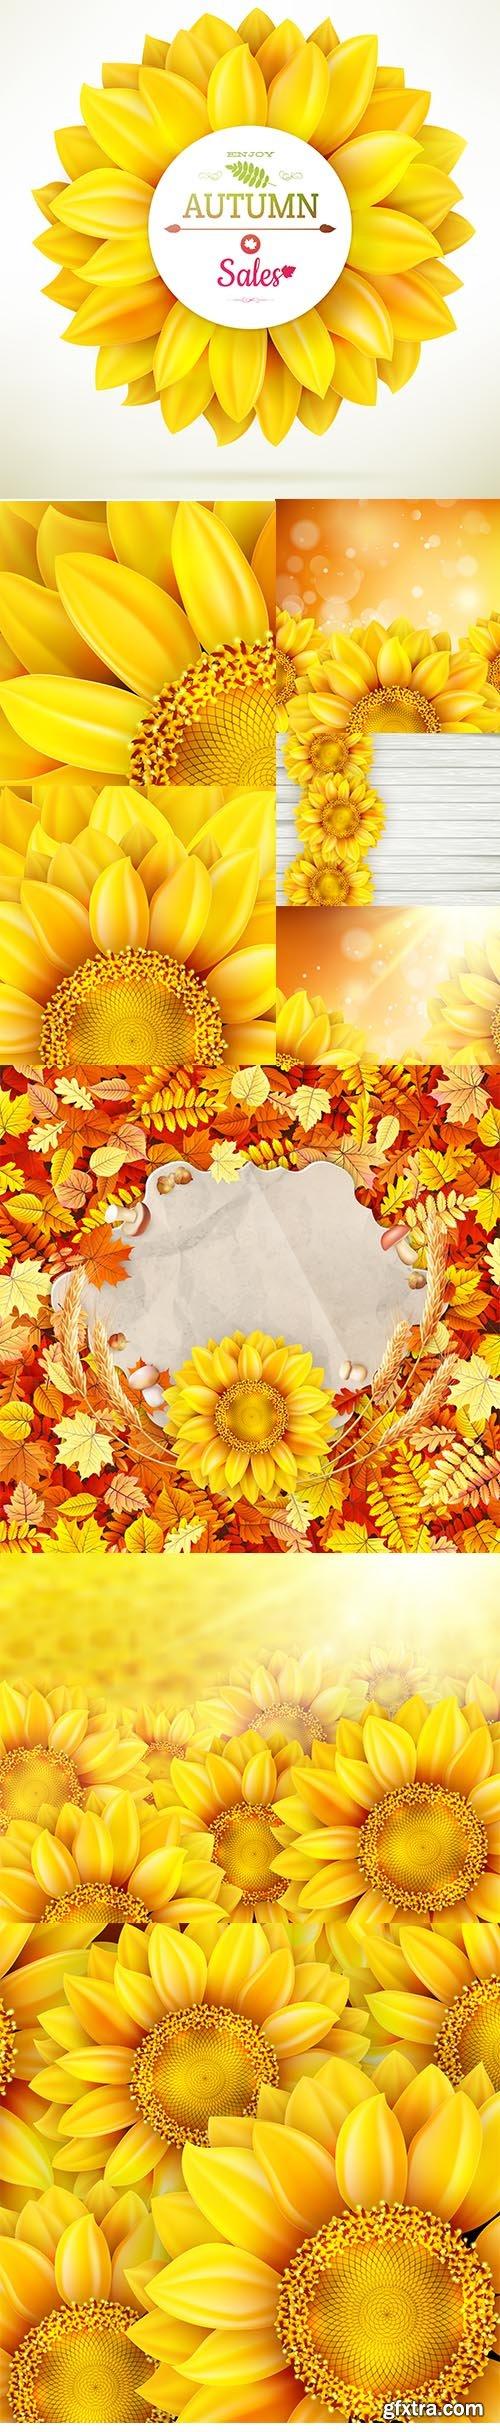 Sunflower High Quality Illustration